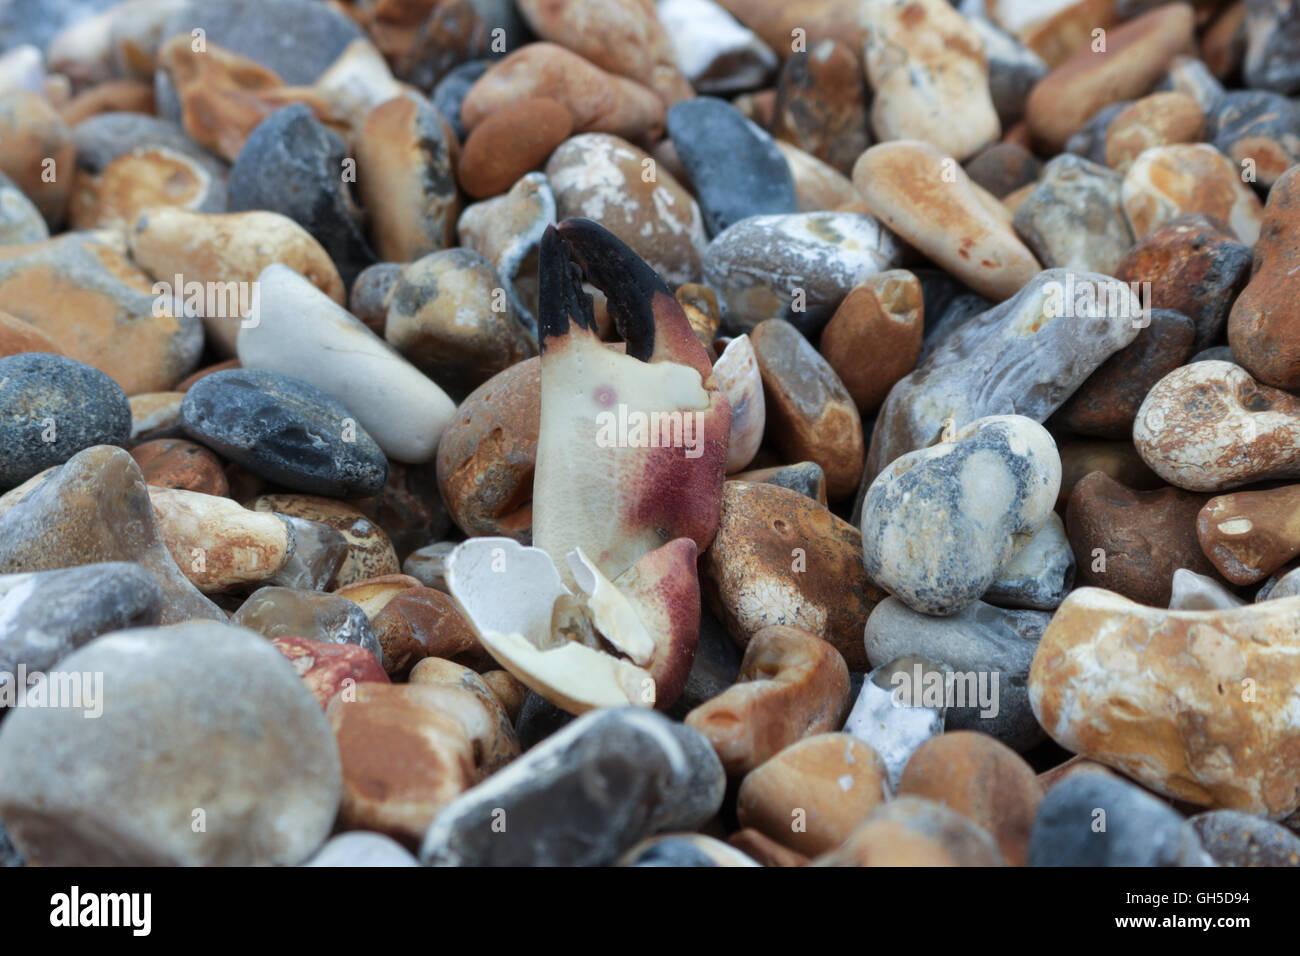 crab claw found on Seaford beach - Stock Image